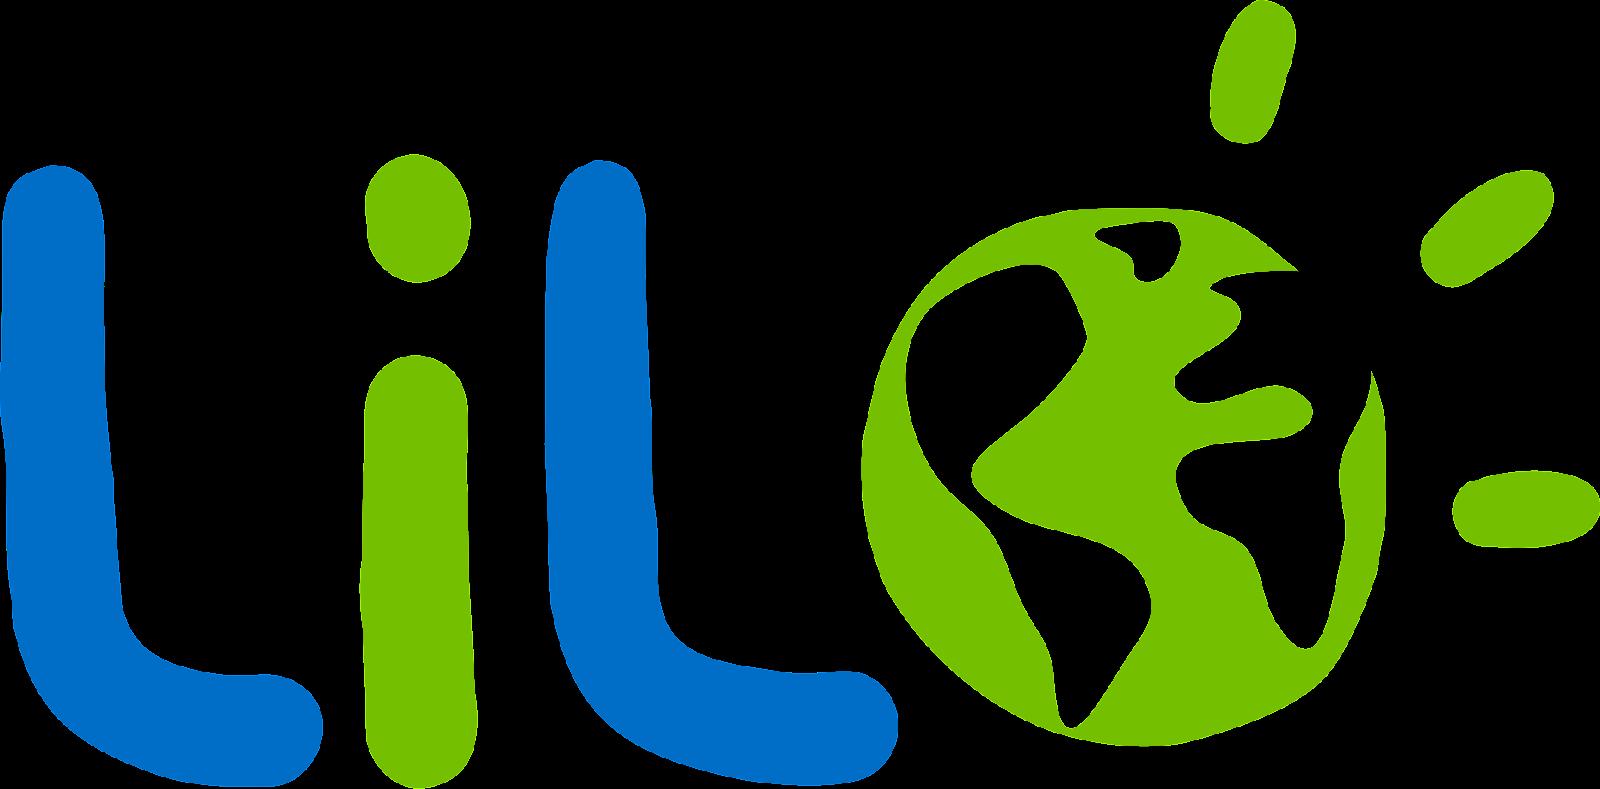 Lilo - logo